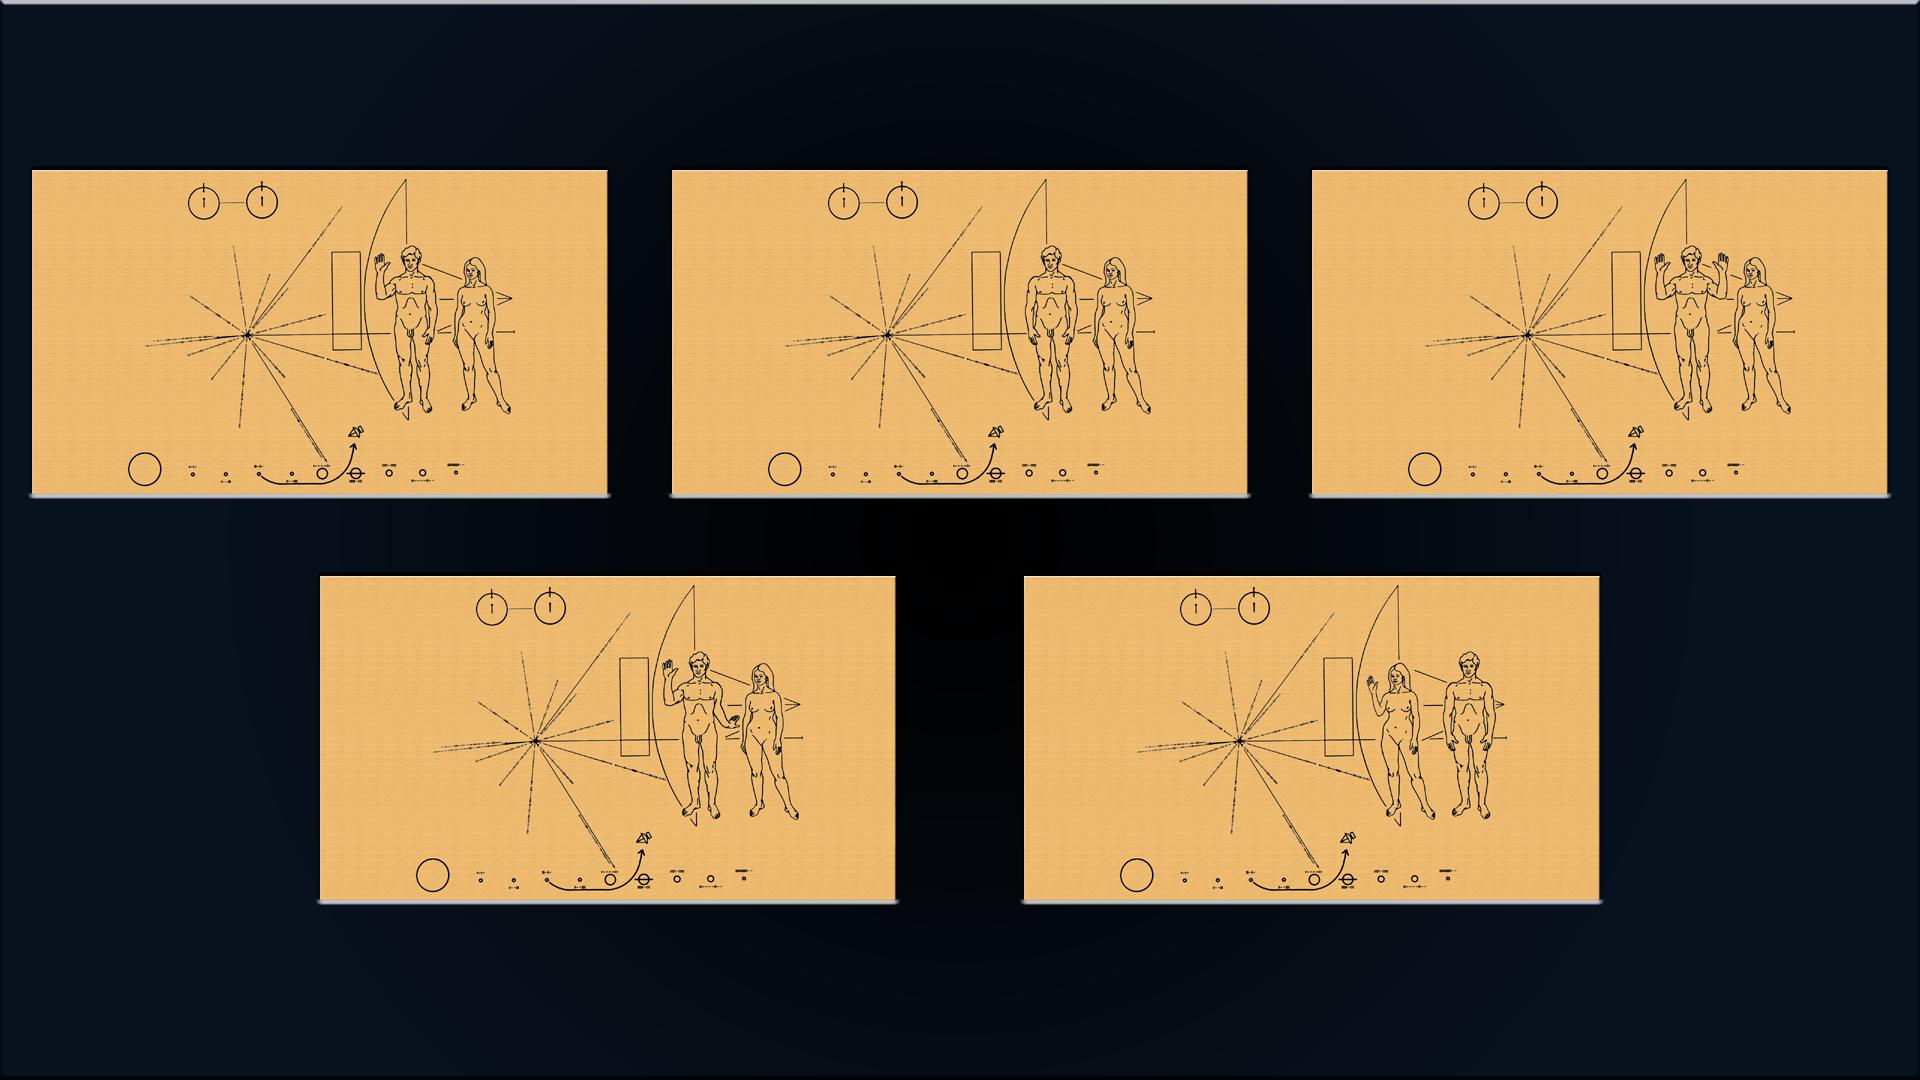 ExoConference - Pioneer 10 Plaque Set